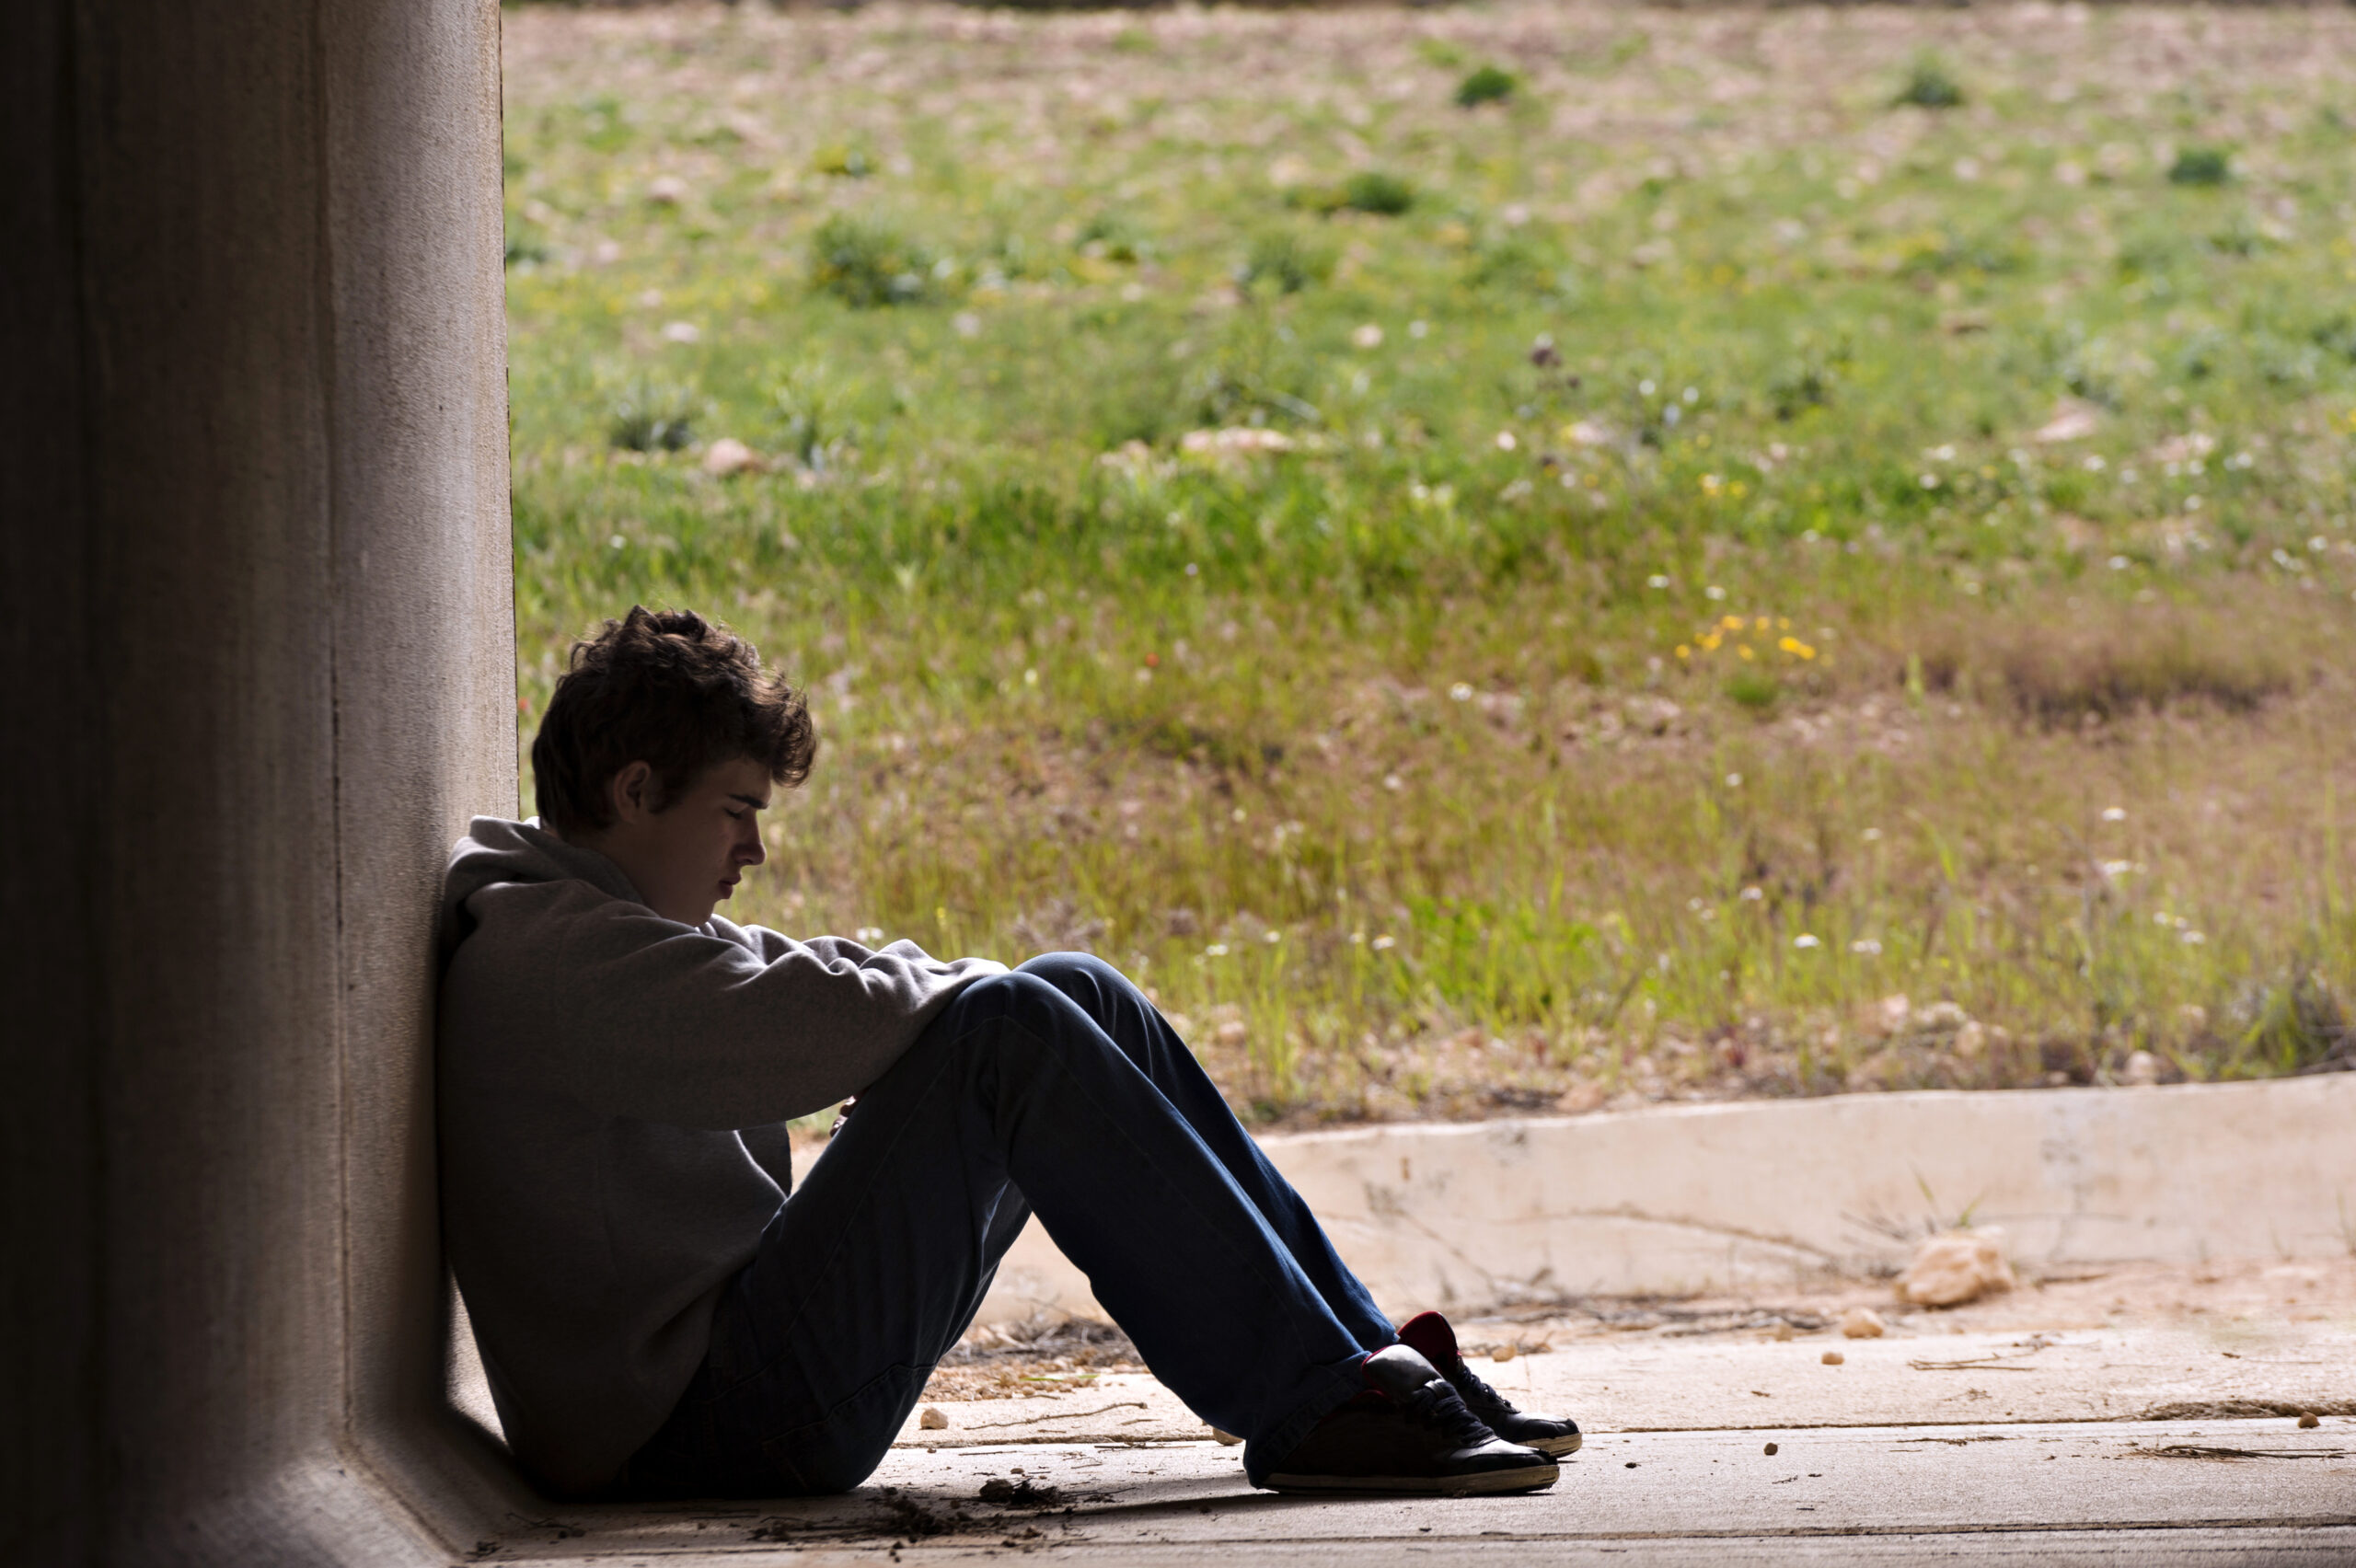 teenage boy looking sad, housing, unemployment, supply of housing